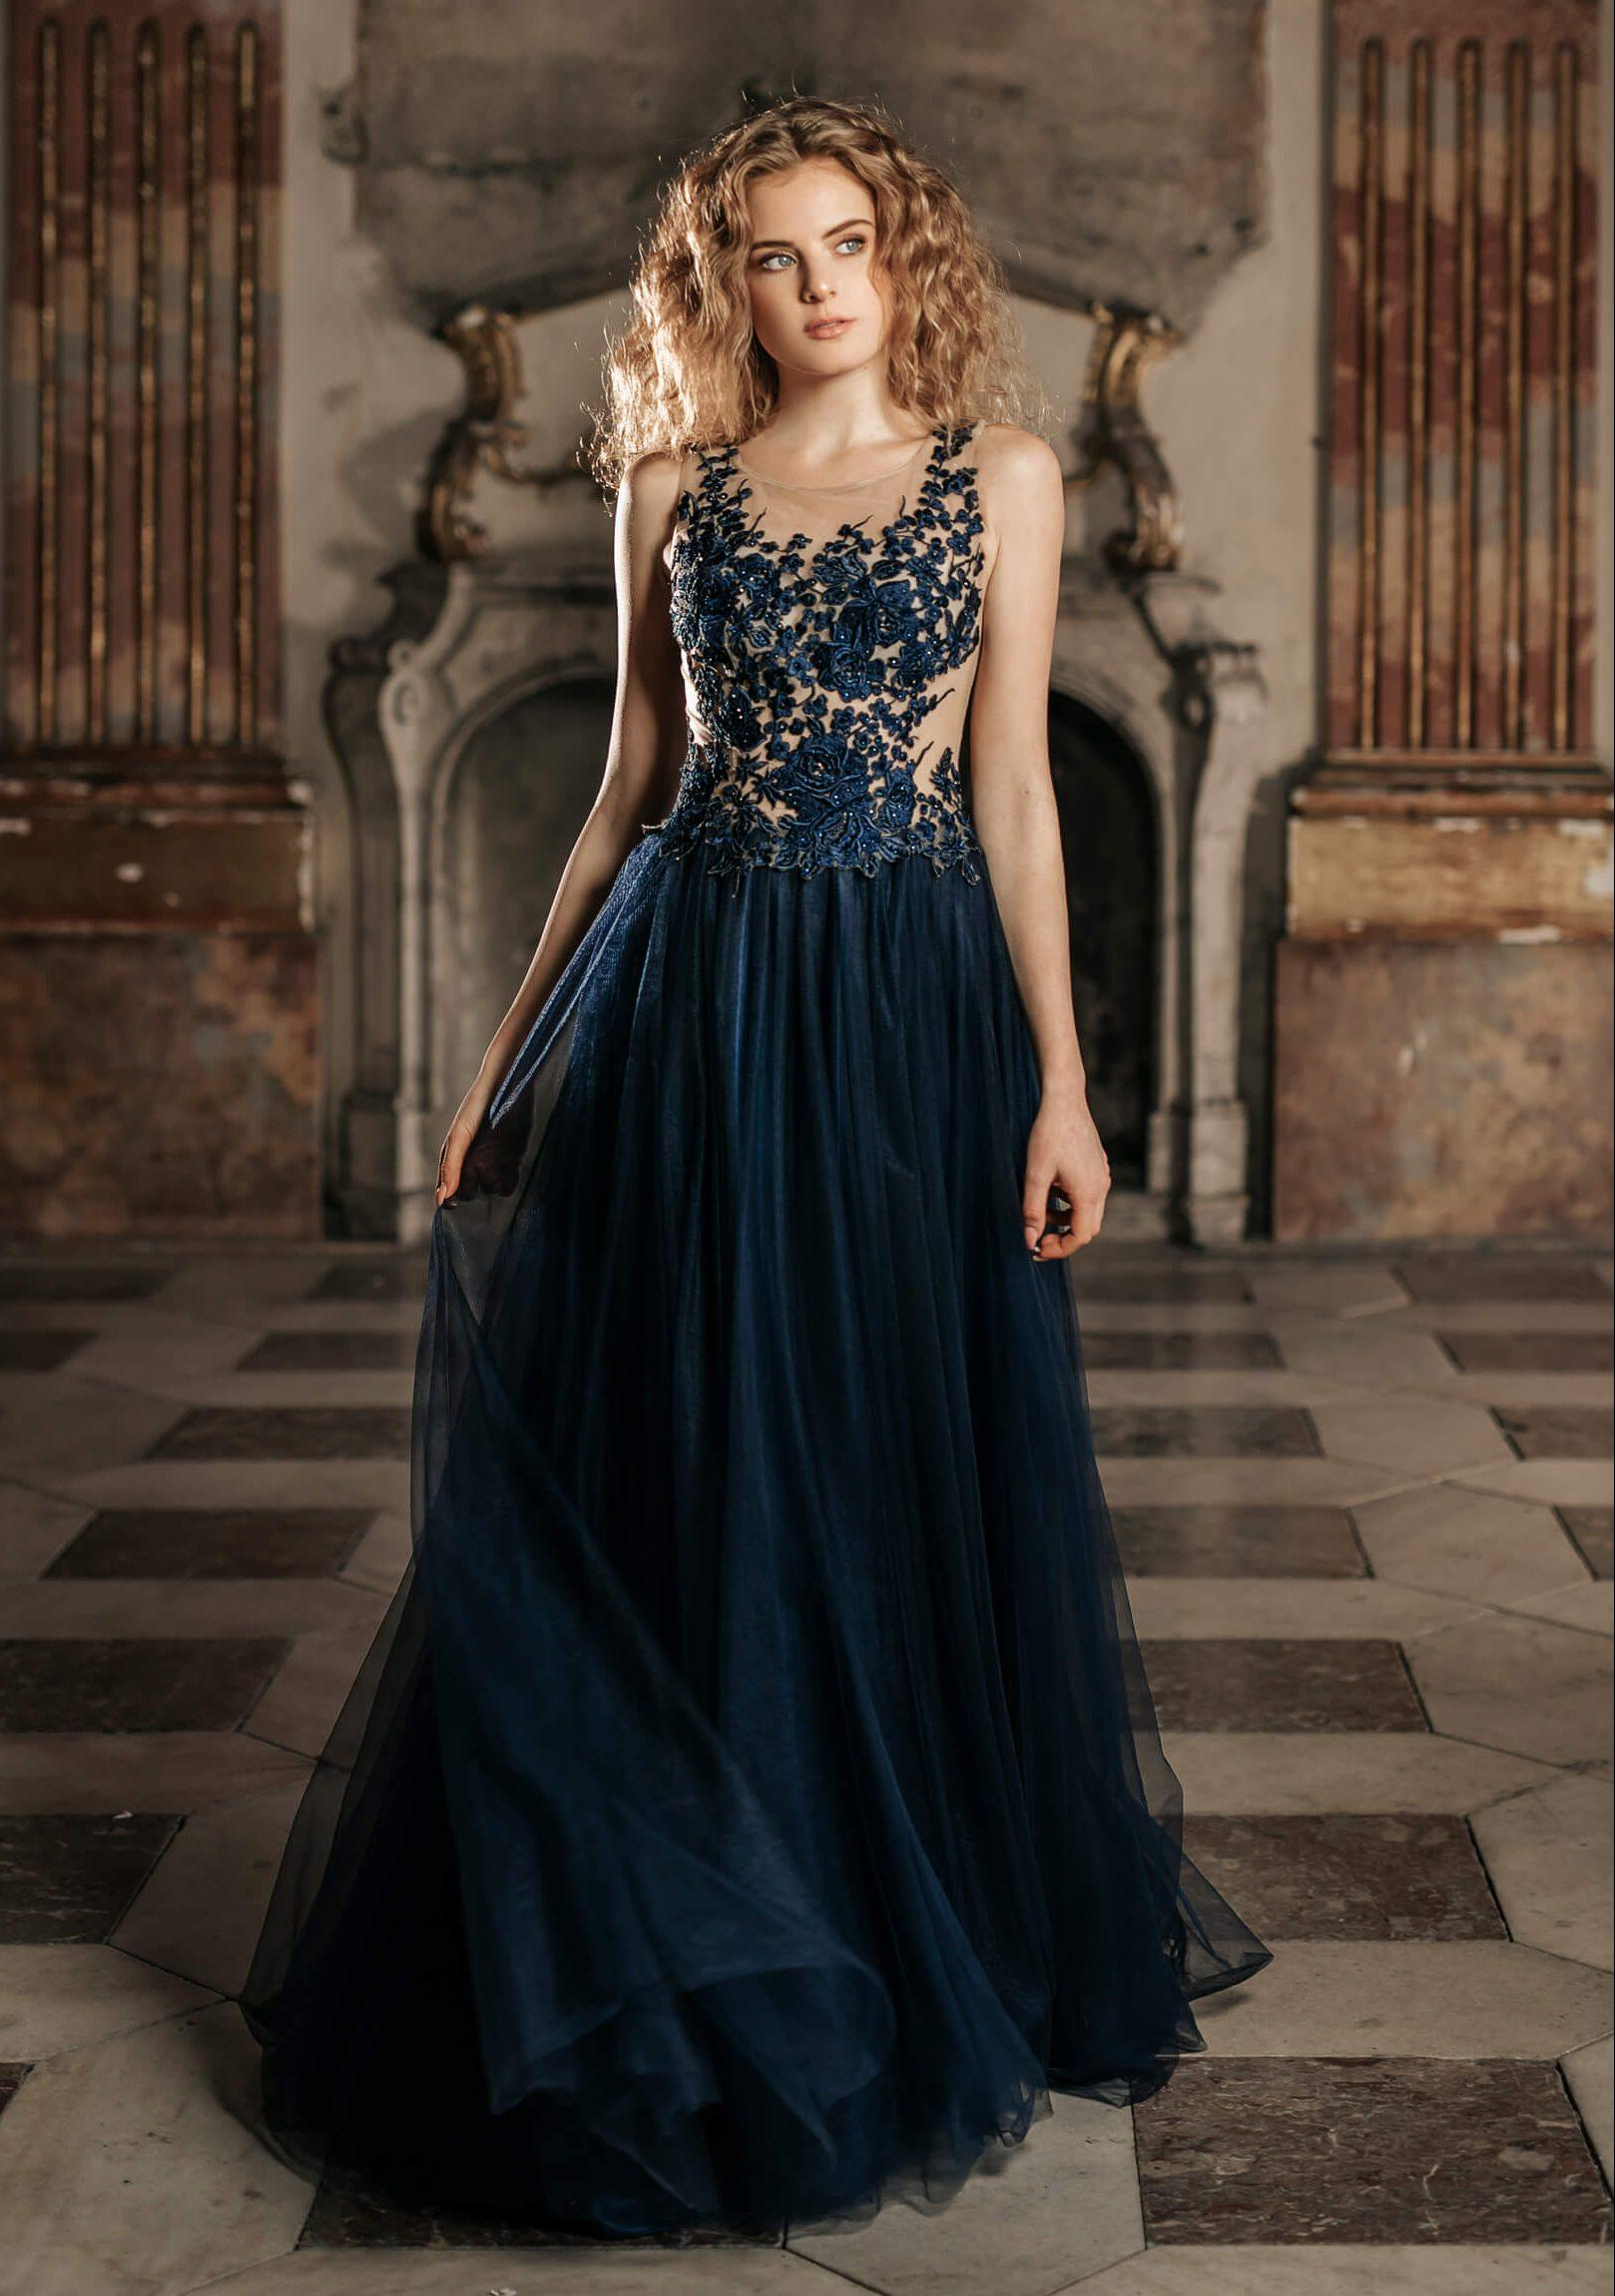 dolga_bogata_princes_svecana_maturantska_obleka_s_cipko